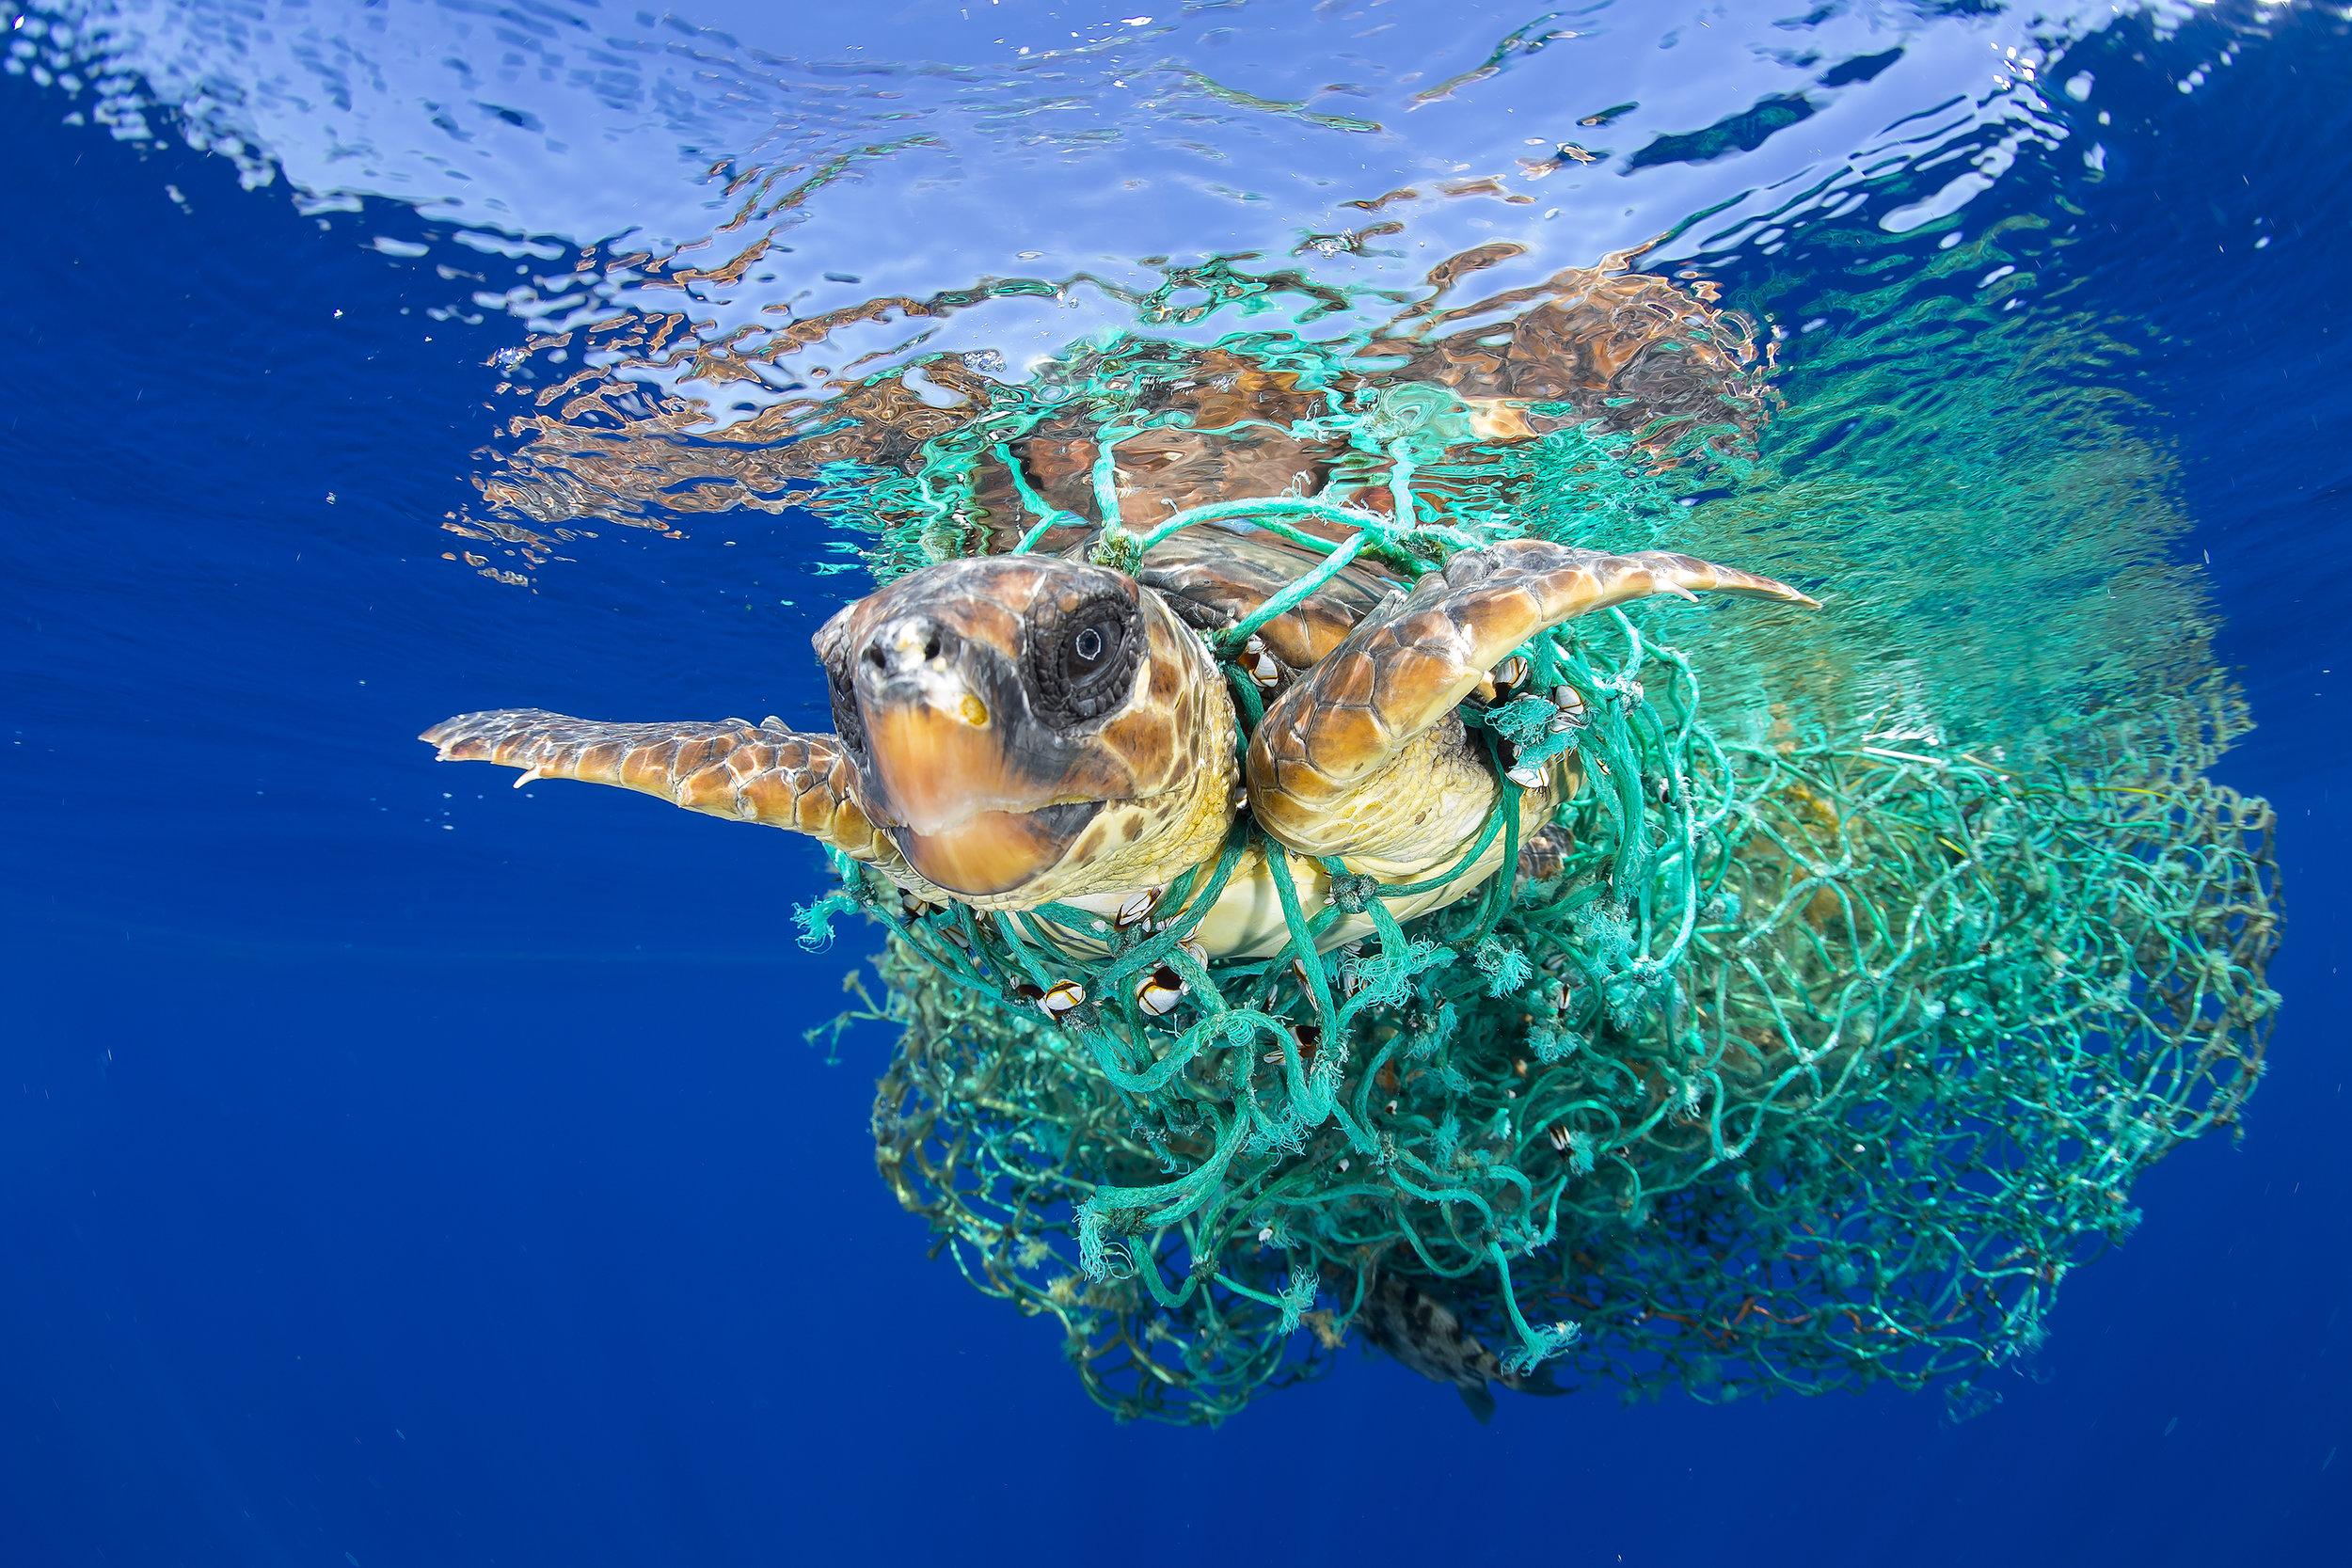 © Francis Pérez  Titel: Meeresschildkröte in der Falle